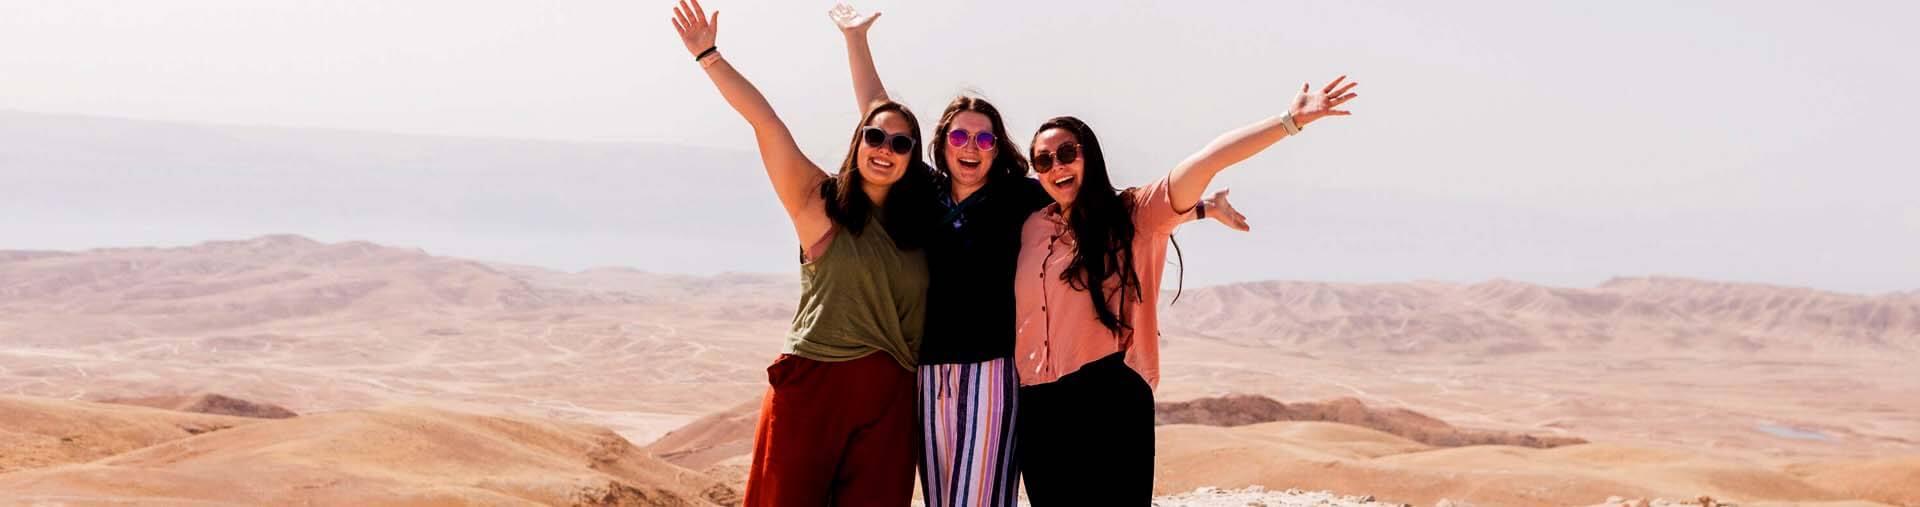 Explore the incredible landscape of the Judean desert